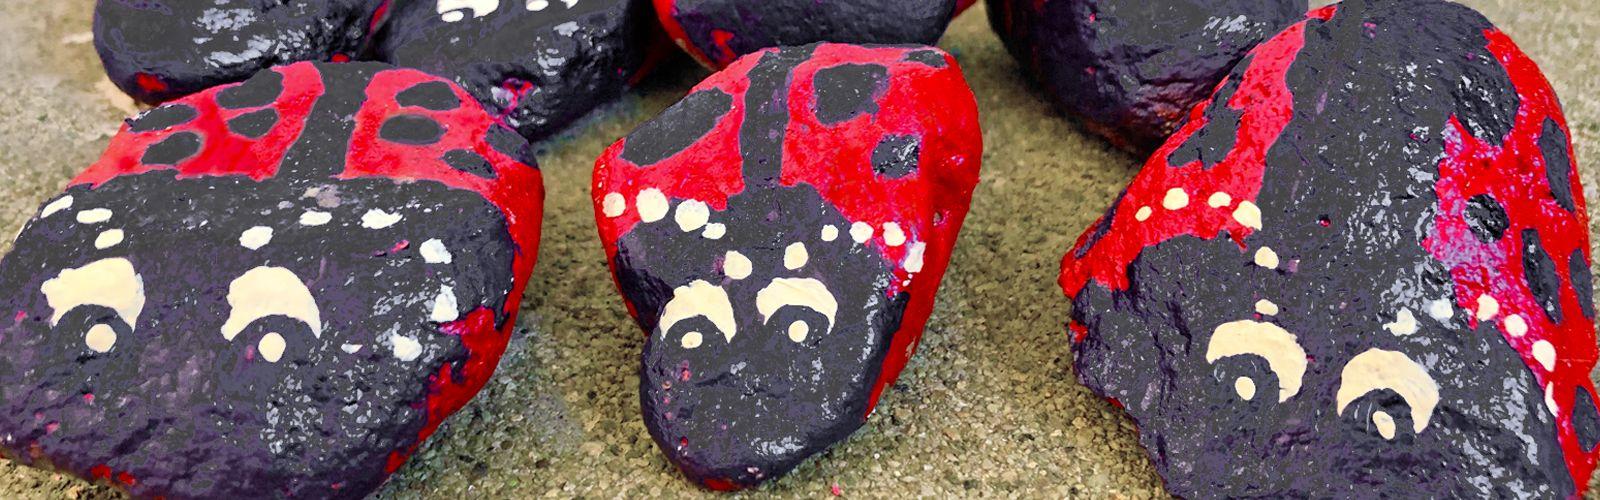 a close up of ladybug rocks